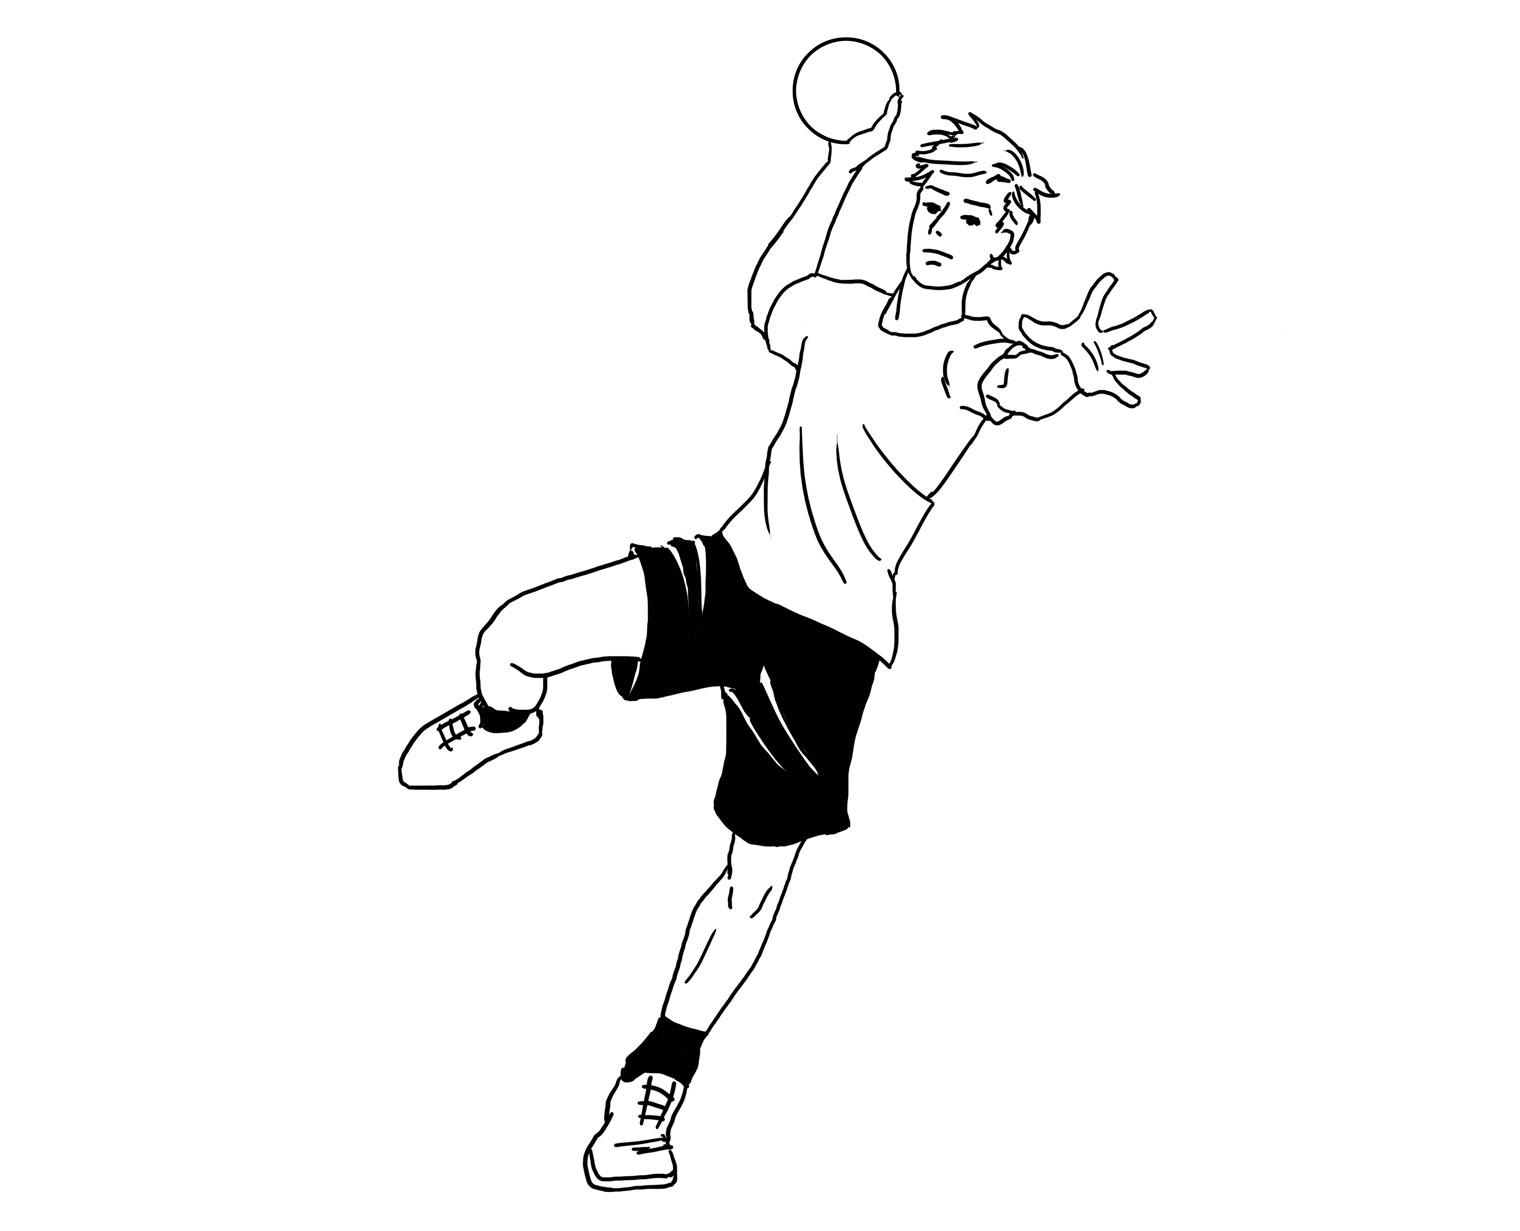 Ilustraciones balonmano